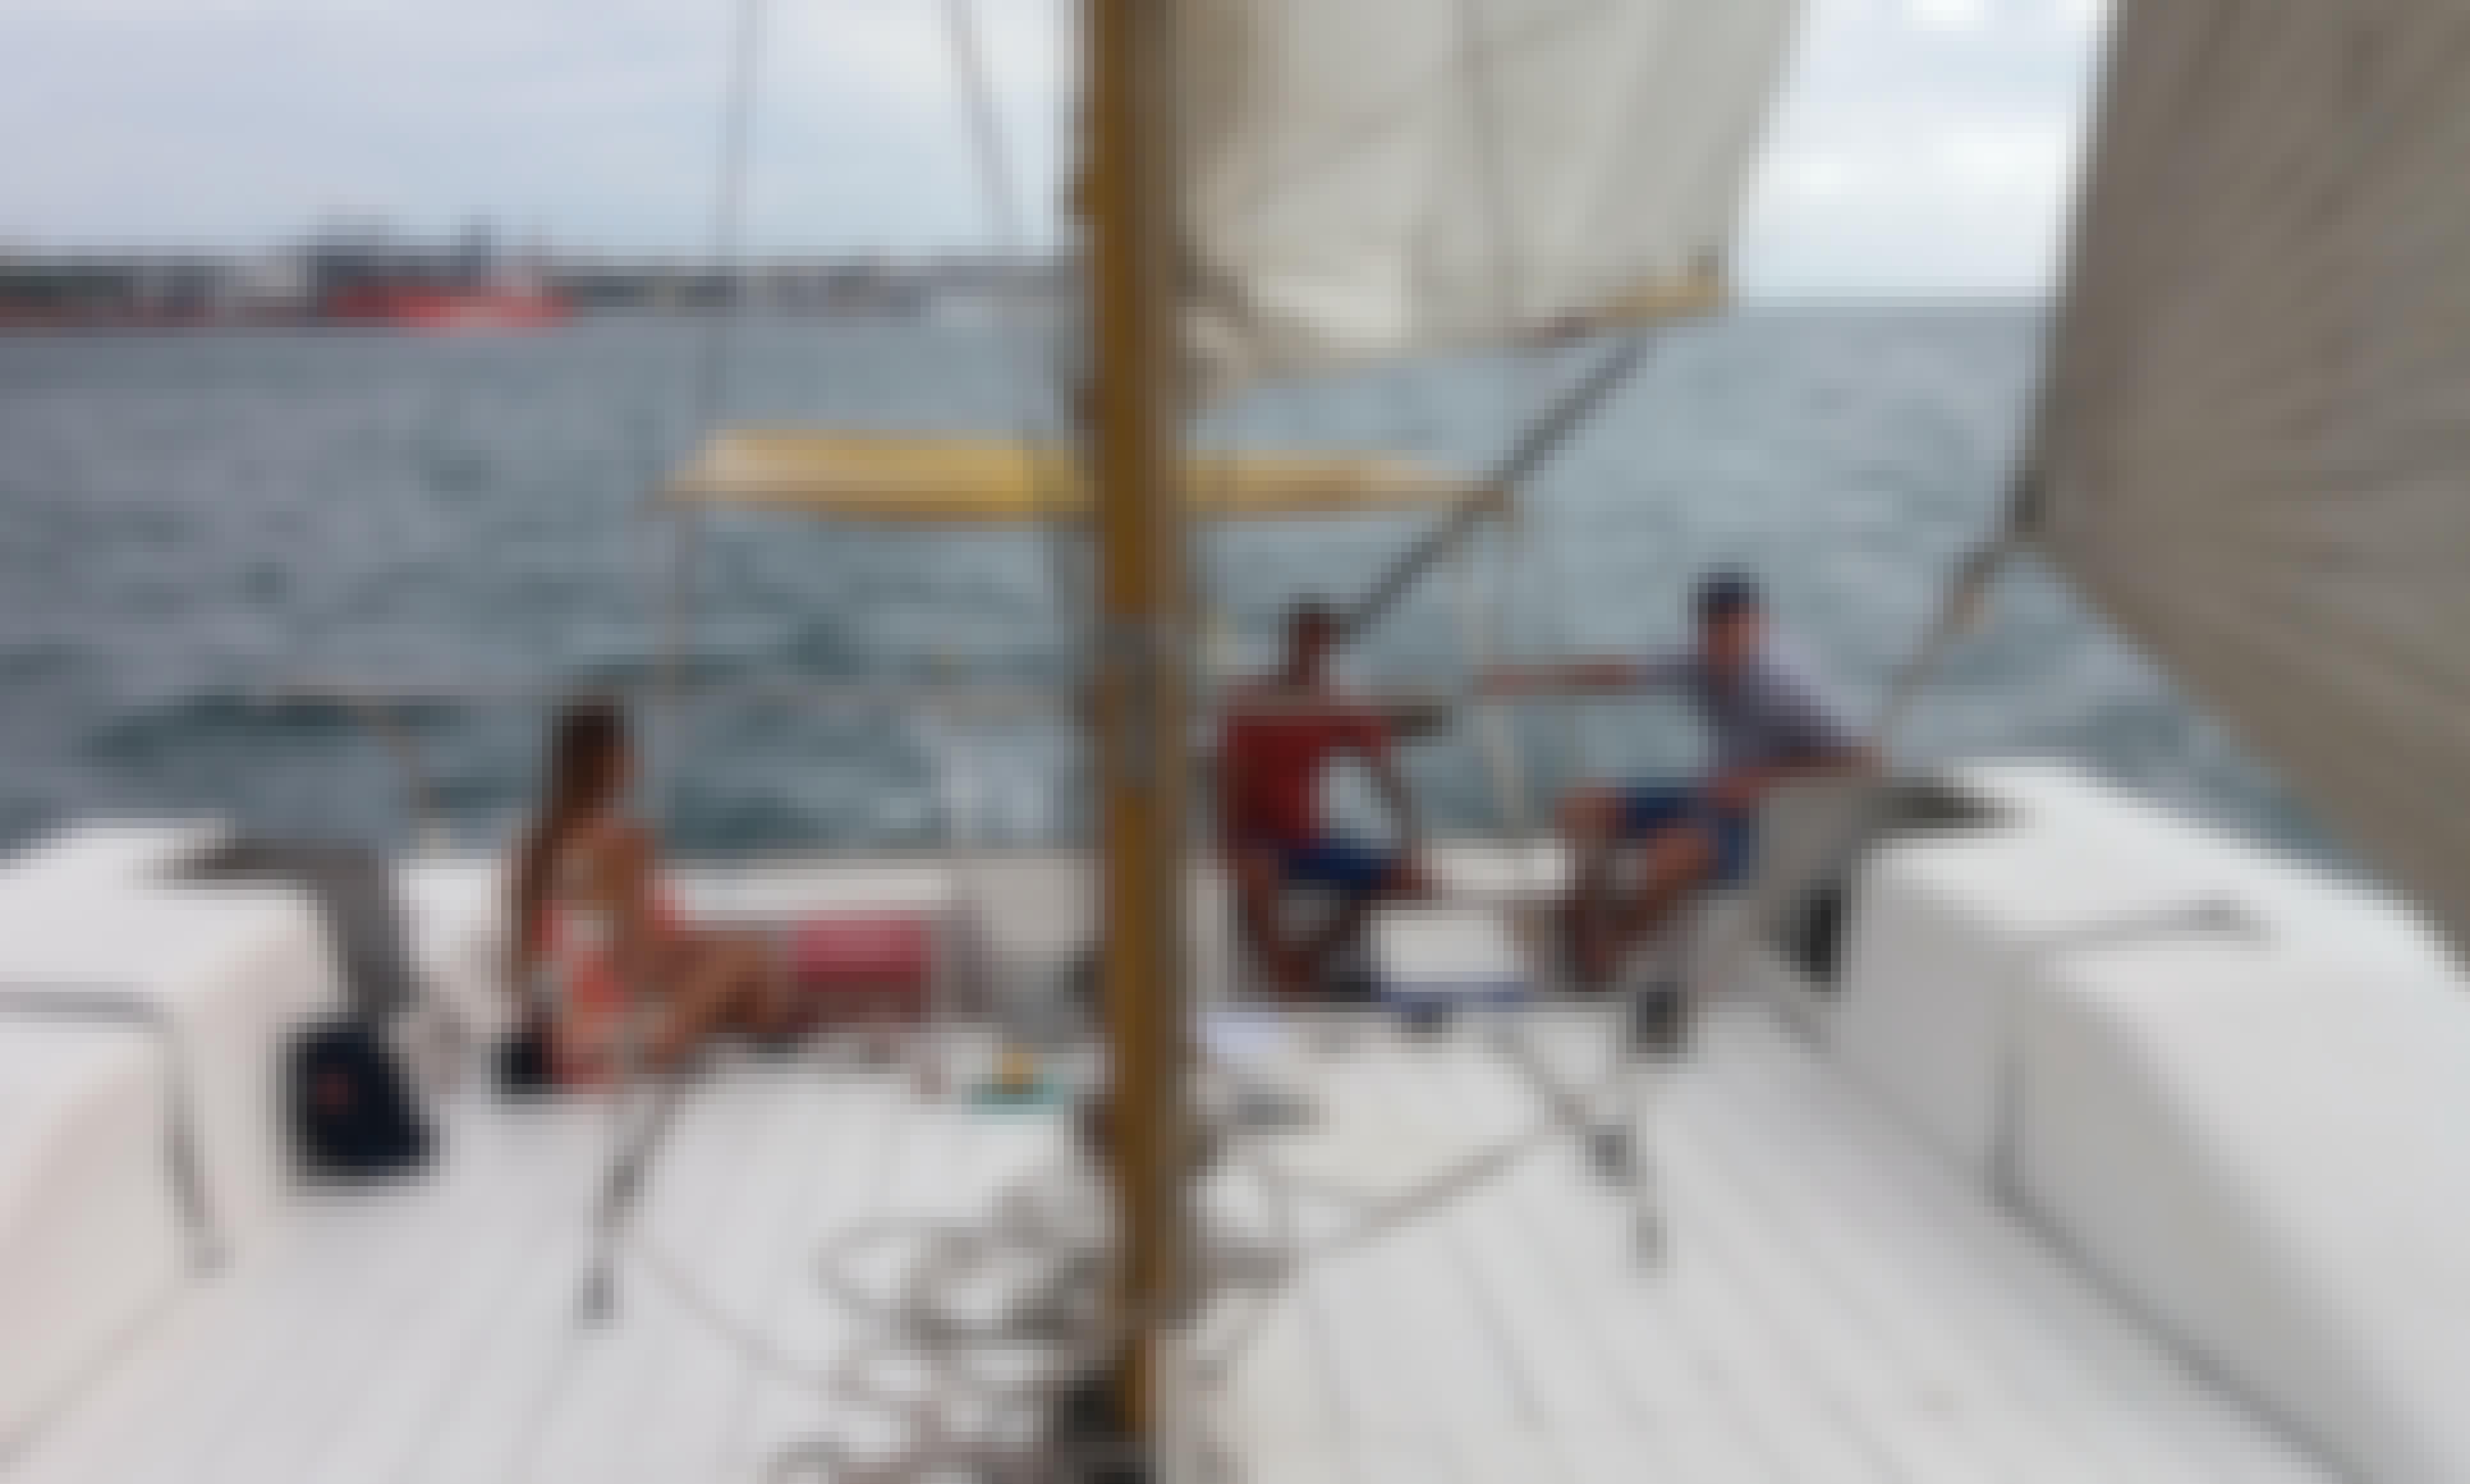 30 ft Aratu Beach Catamaran Rental for 8 People in Bahia, Brazil